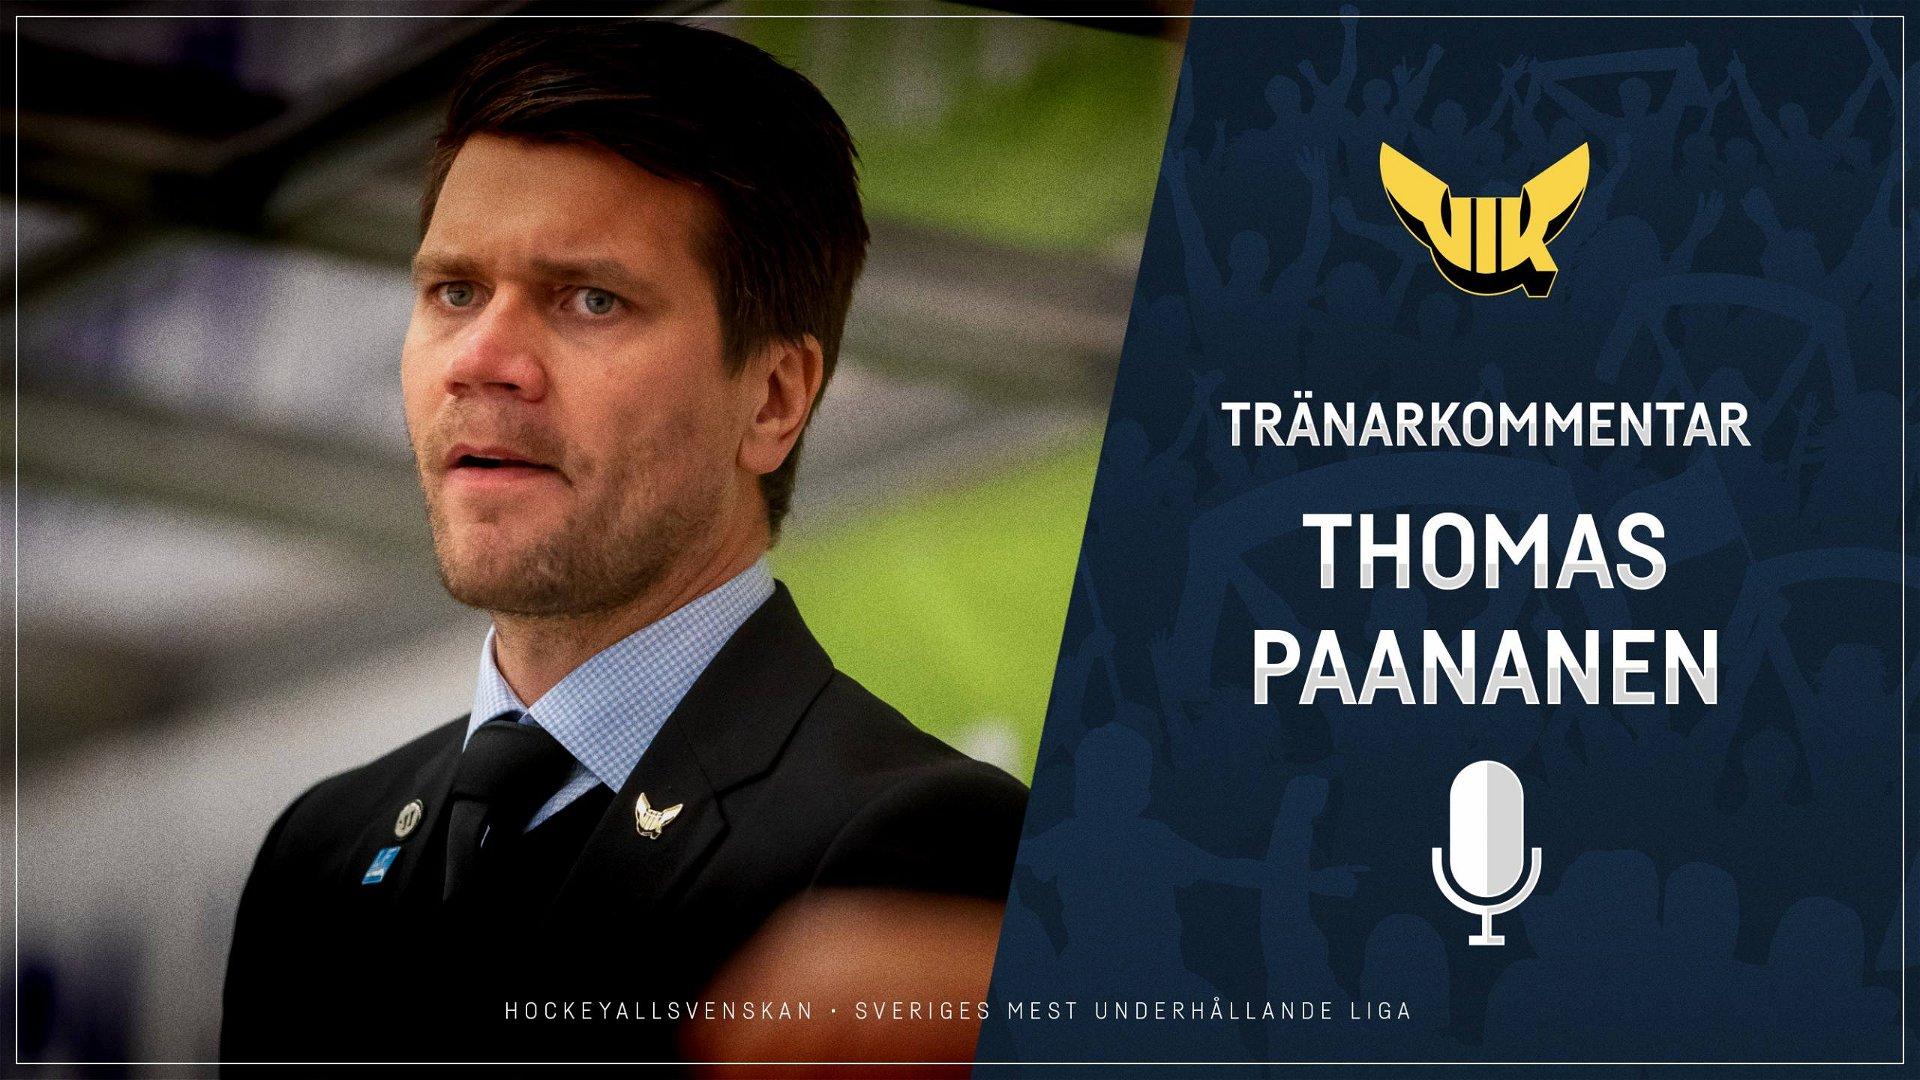 2020-11-04 Segerintervju: Thomas Paananen